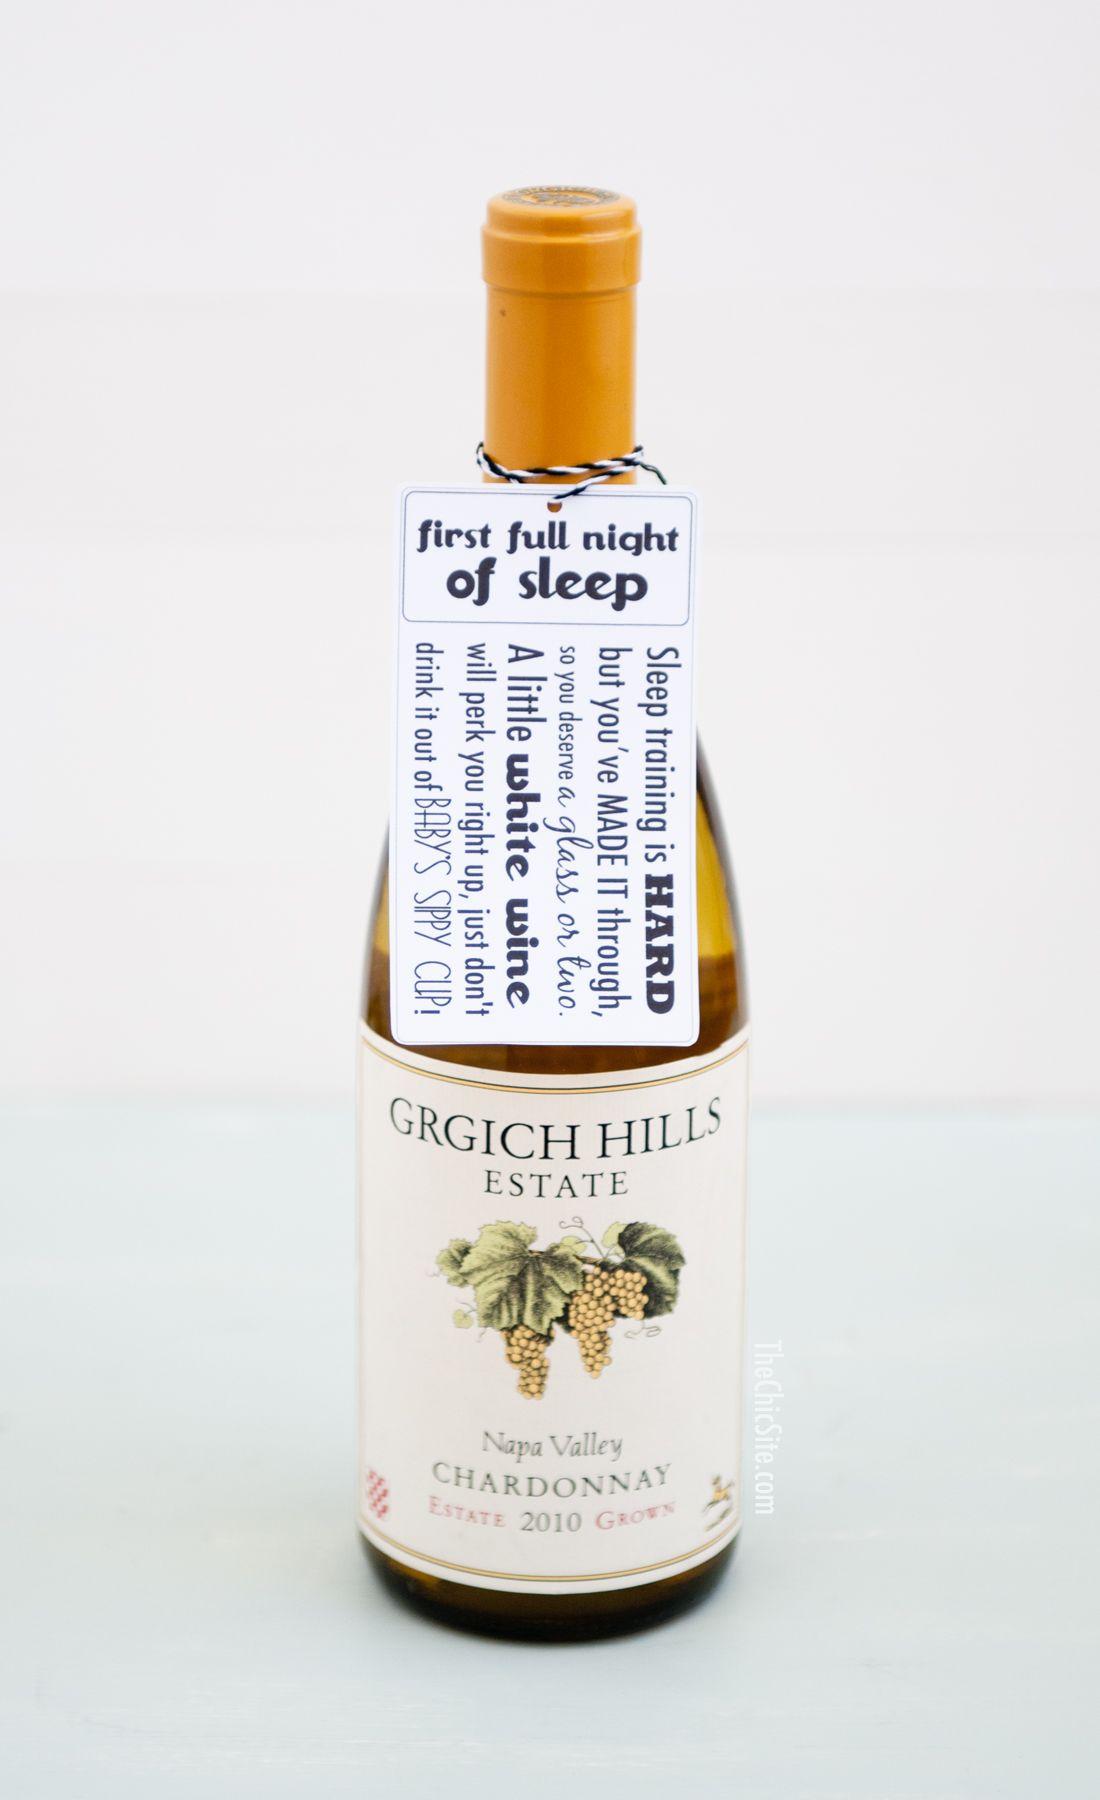 wine wedding shower gift poem%0A Grgich Hills Estate Napa Valley Chardonnay White Wine Tag for Baby Shower  Gift